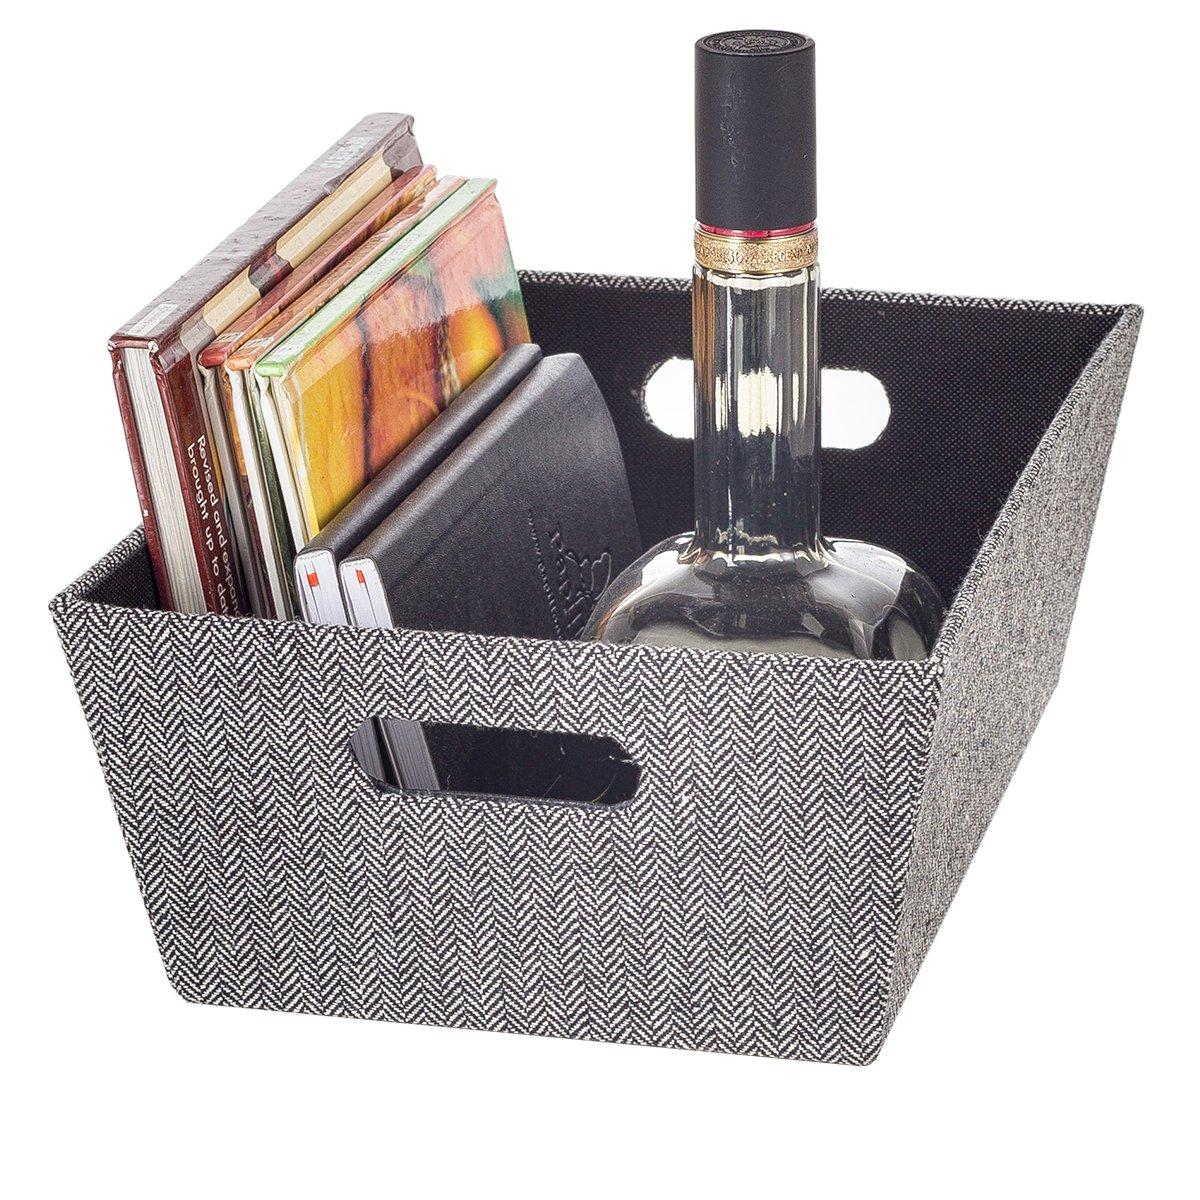 8c7fddd5466d Buy Creative Scents Fabric Storage Bin, Black & White Herringbone ...